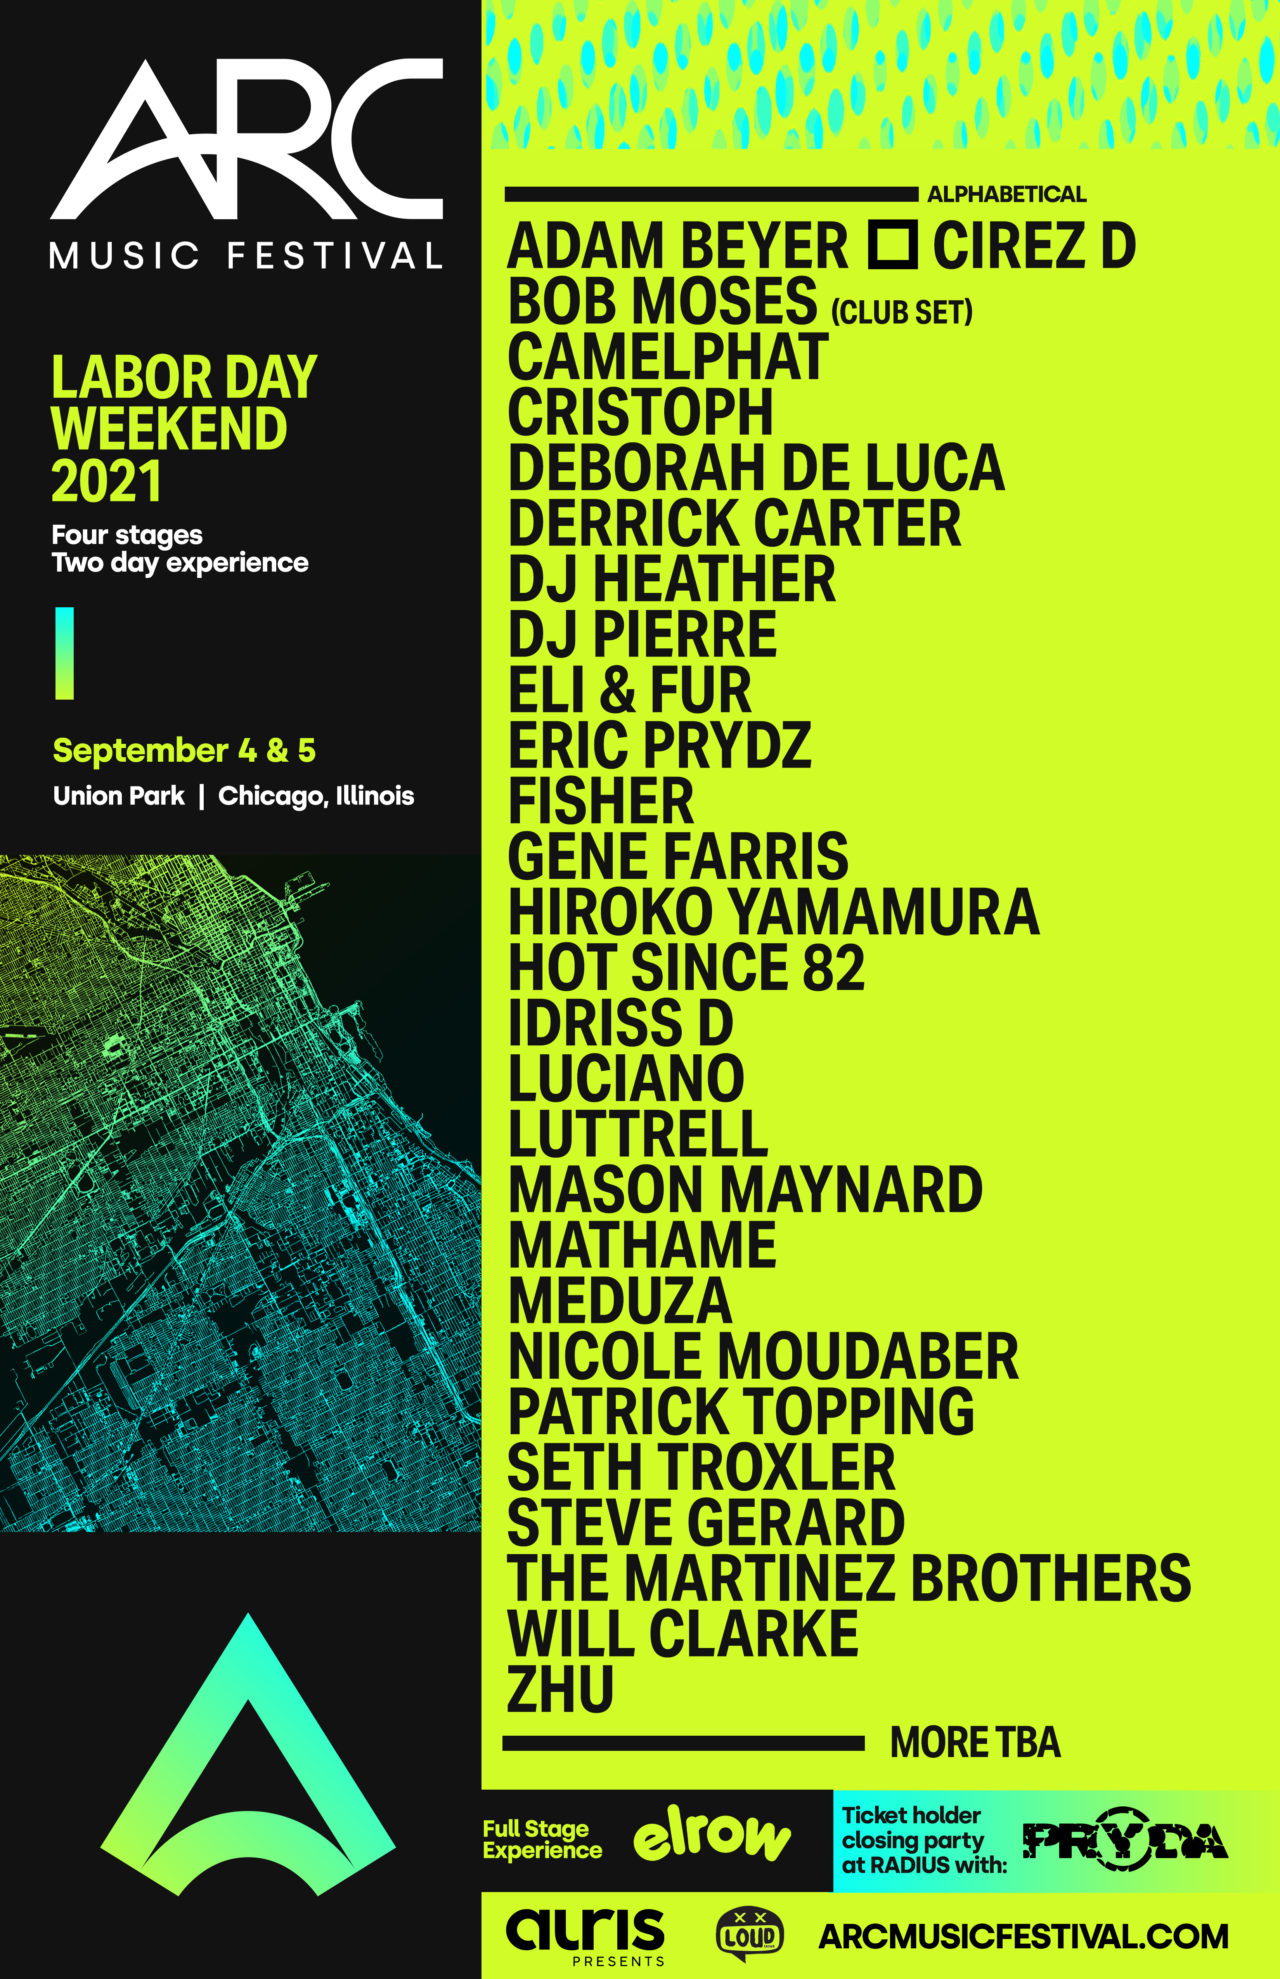 ARC Music Festival line-up